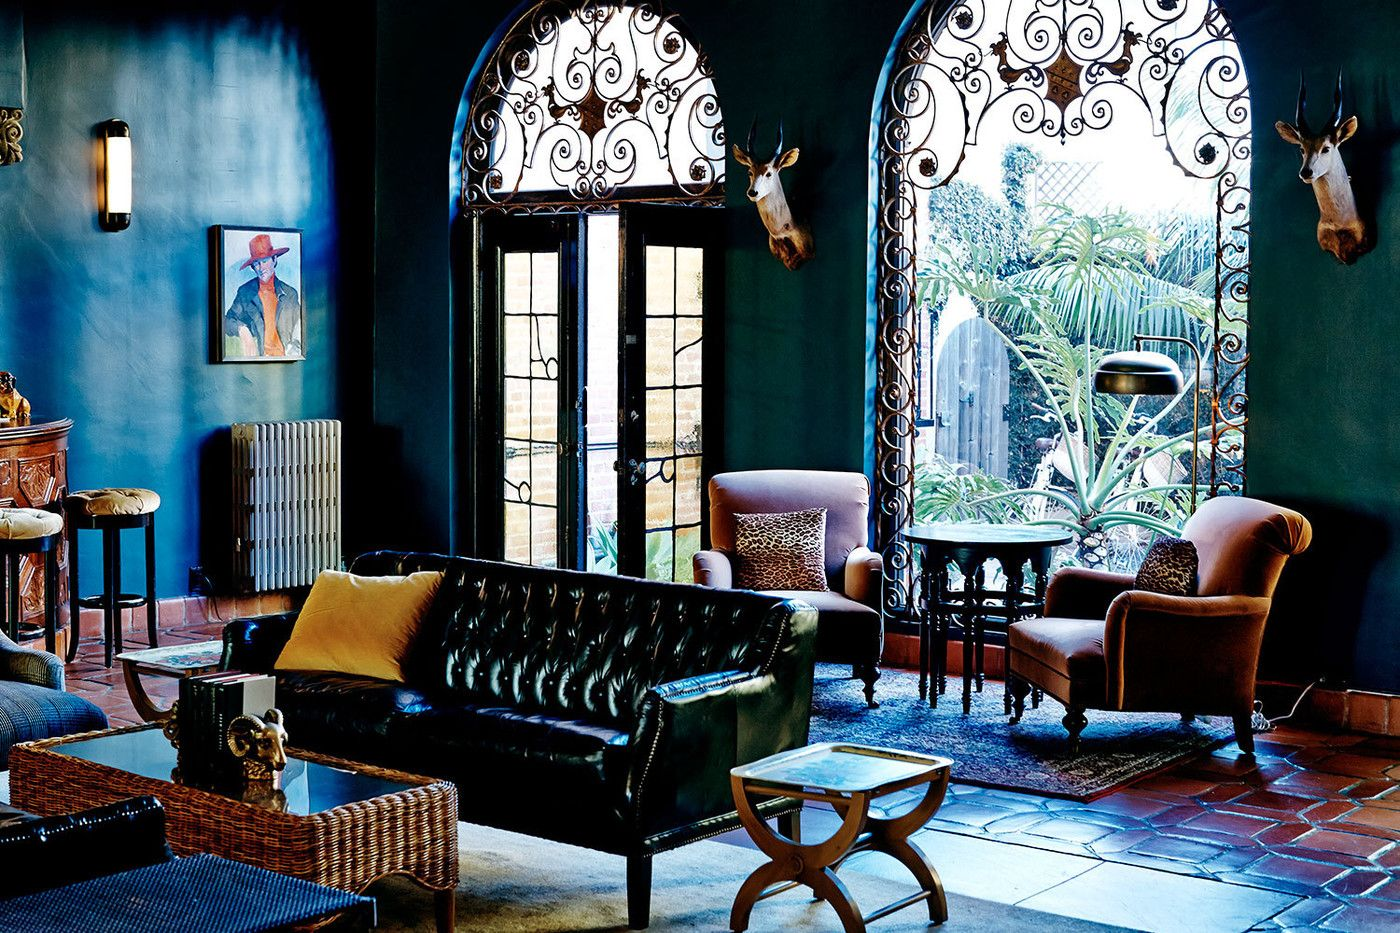 santa monica sofa set camas bogota modernos eclectic living room photos chesterfield